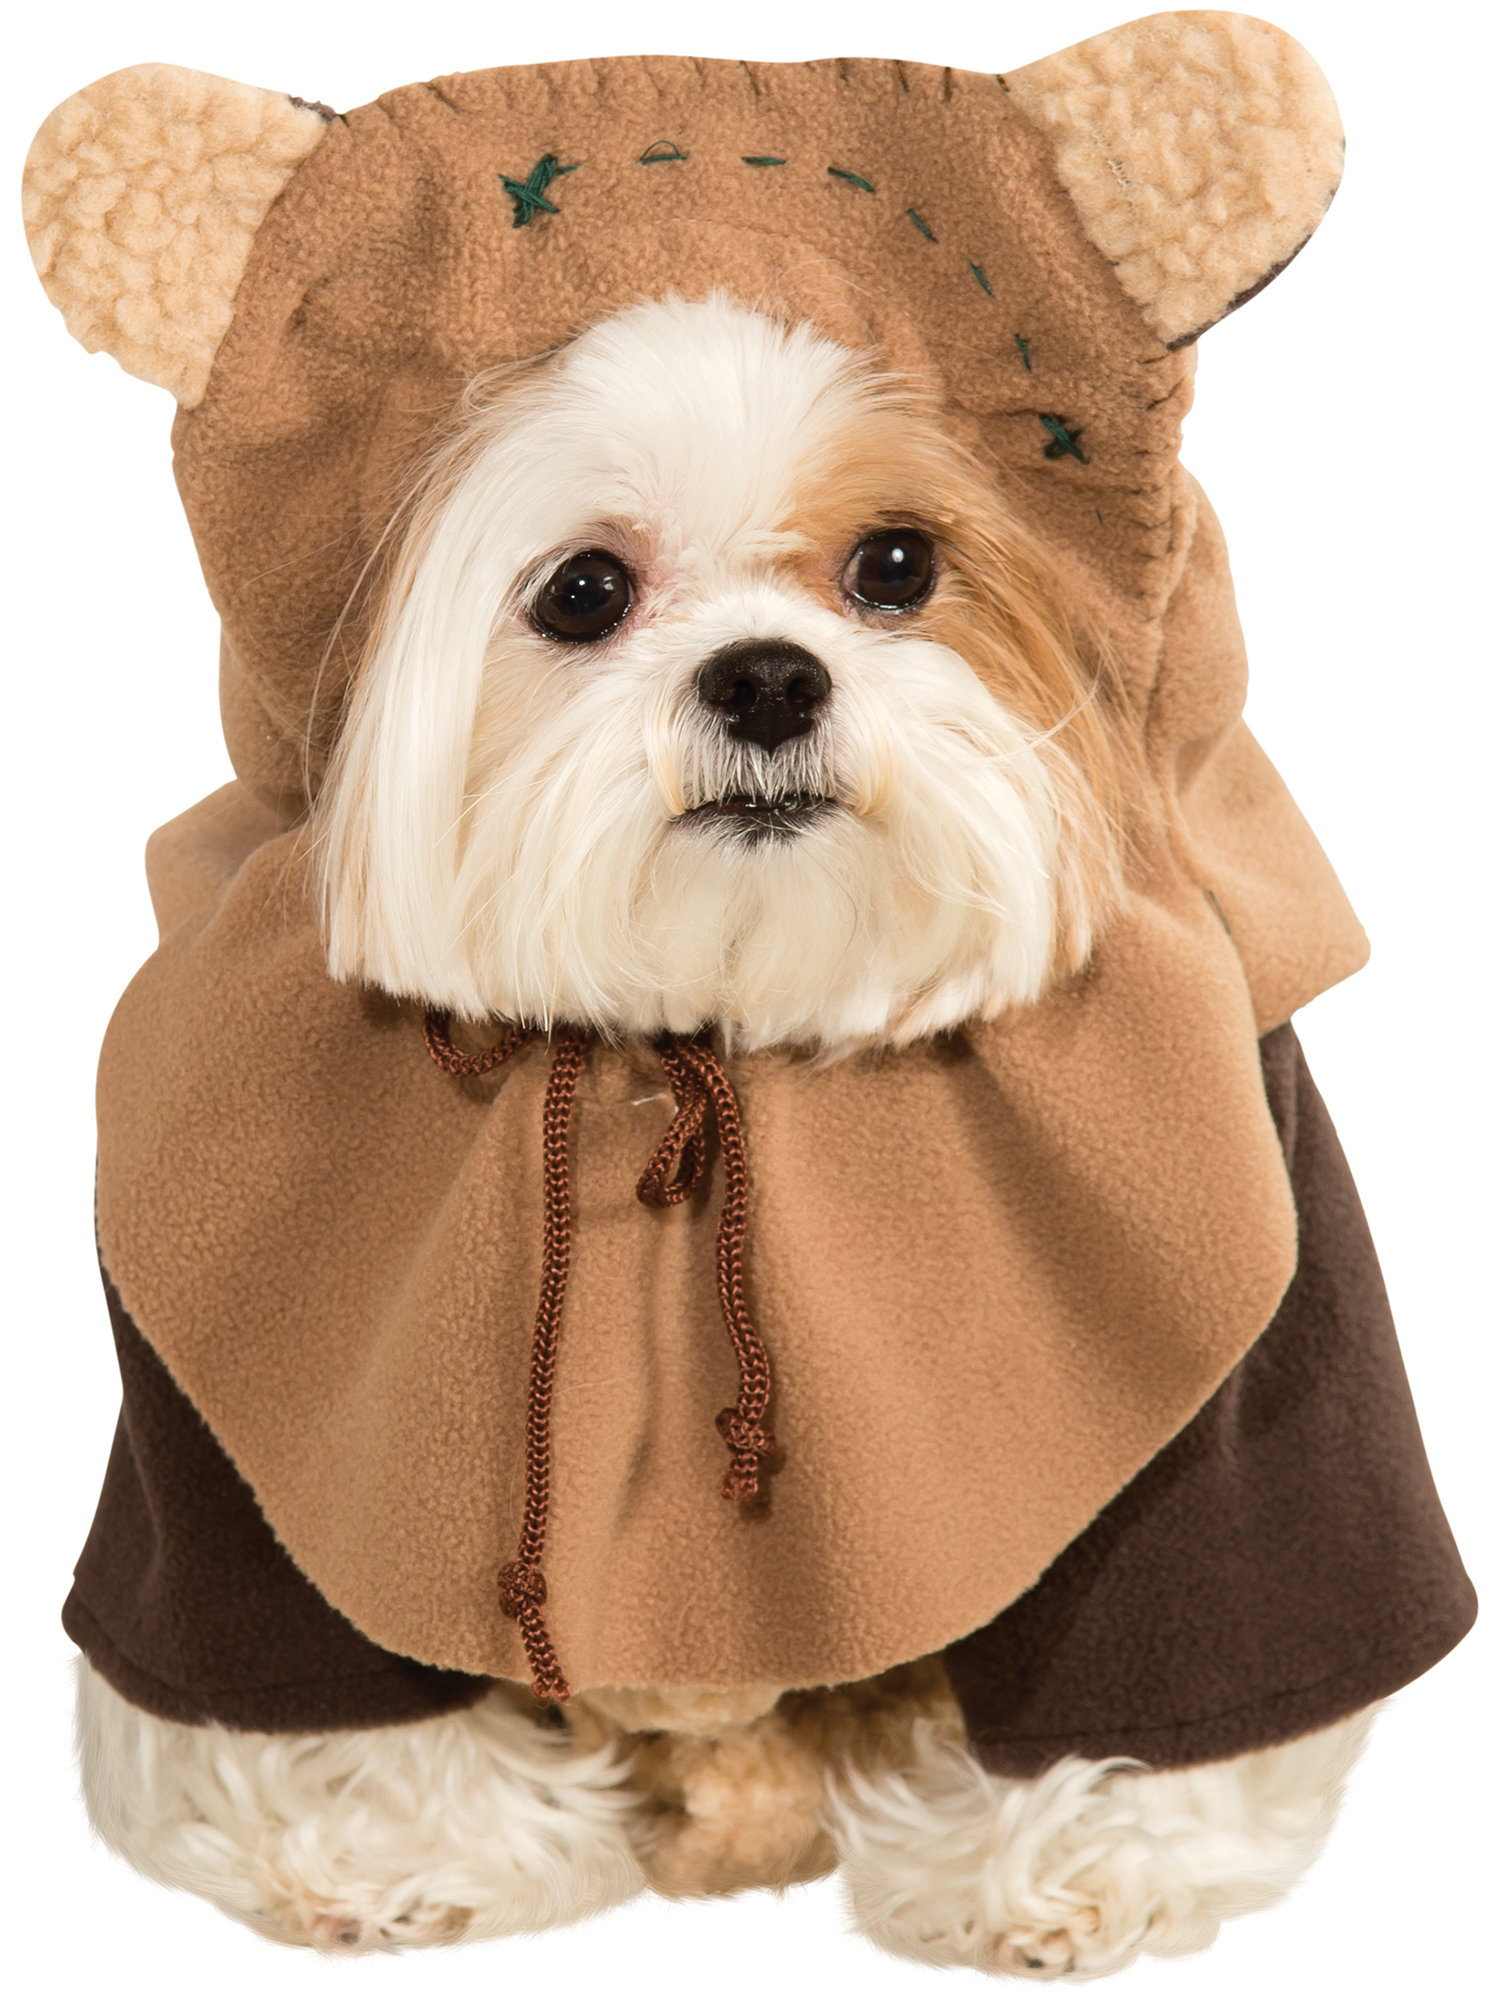 Star Wars , Ewok Dog Costume